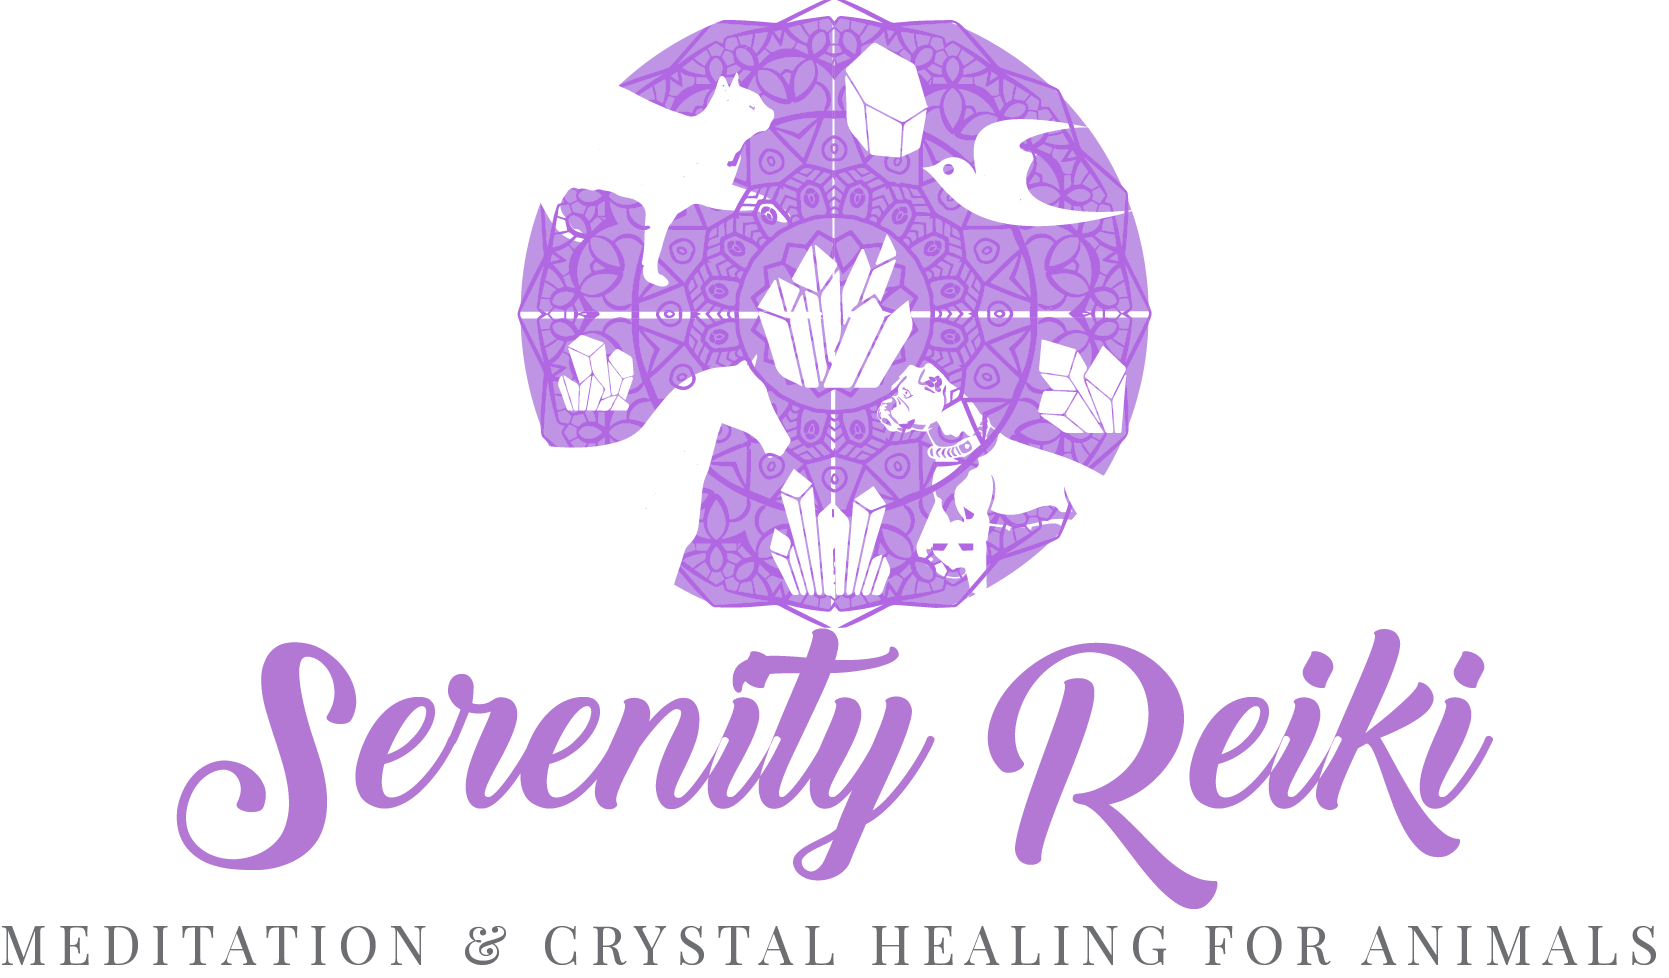 Spiritual Healing for Animals by Dulsanea founder of Serenity Reiki